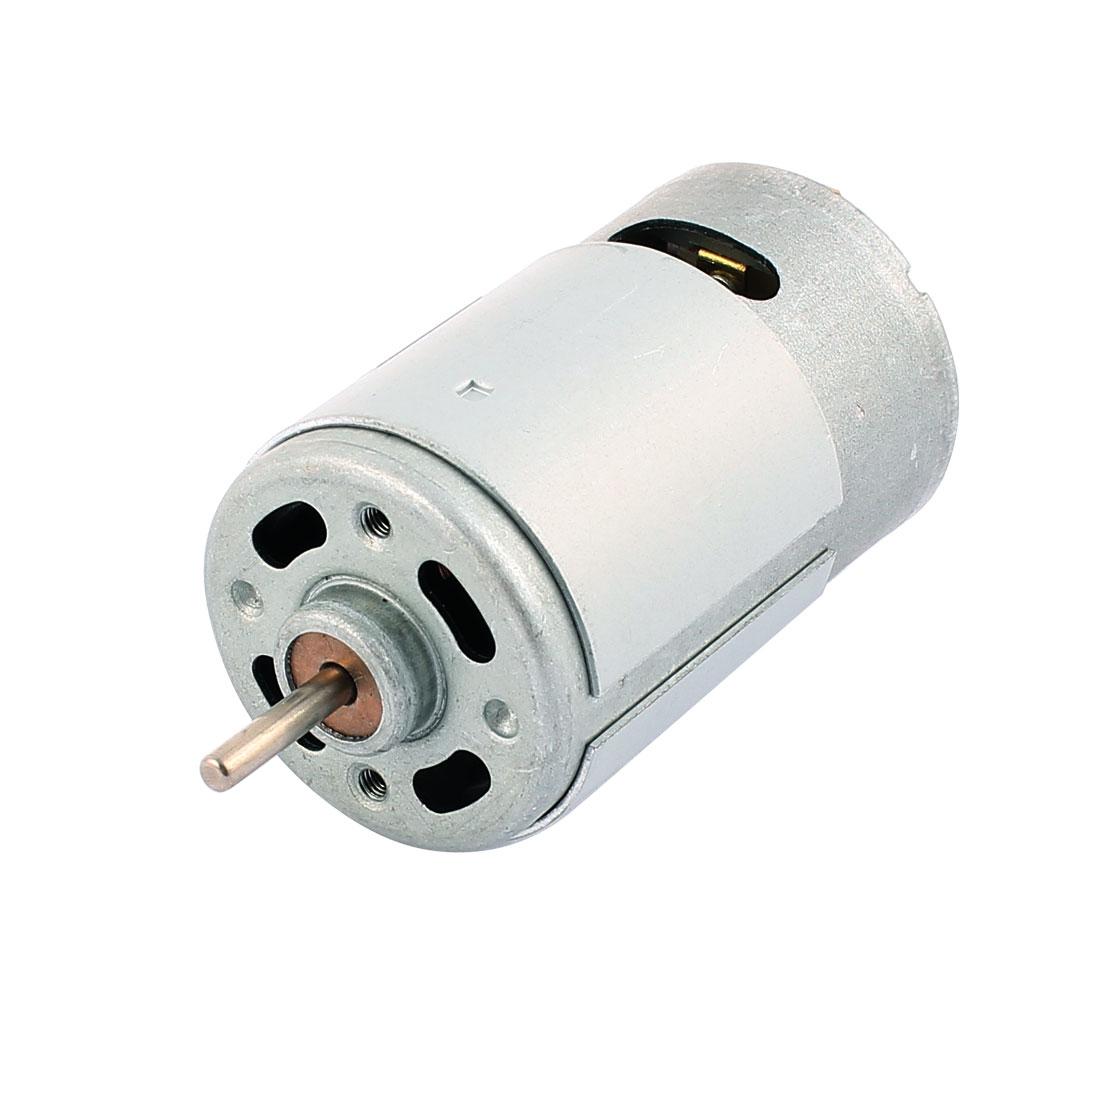 DC 12V 11500R/Min Cylindrical Miniature Model Gear Motor R550 for Car Airplane